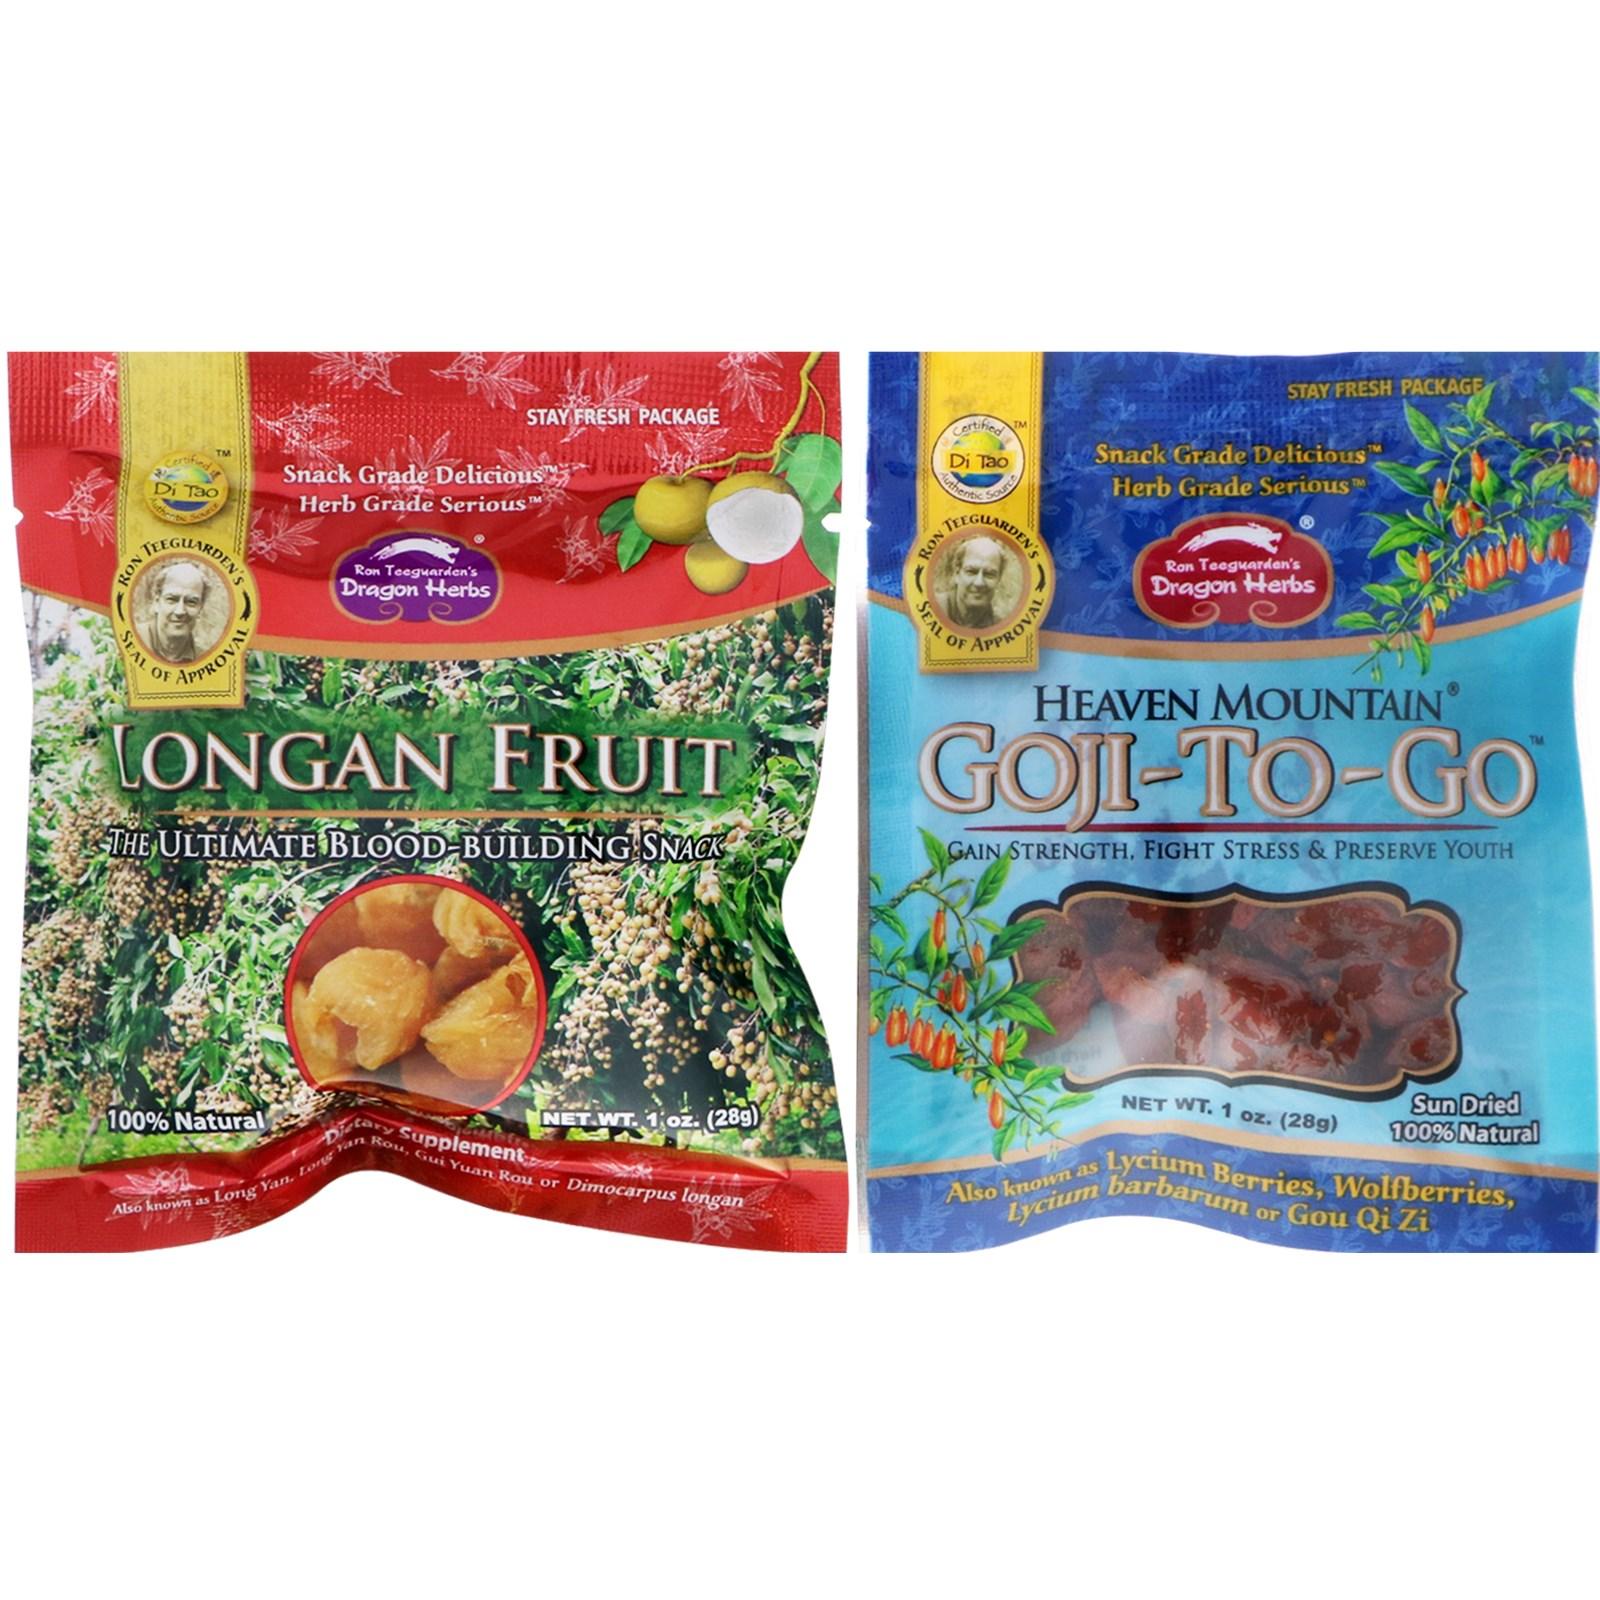 Dragon Herbs, Goji-To-Go & Longan Fruit Combo Pack, 1 oz (28 g) Each